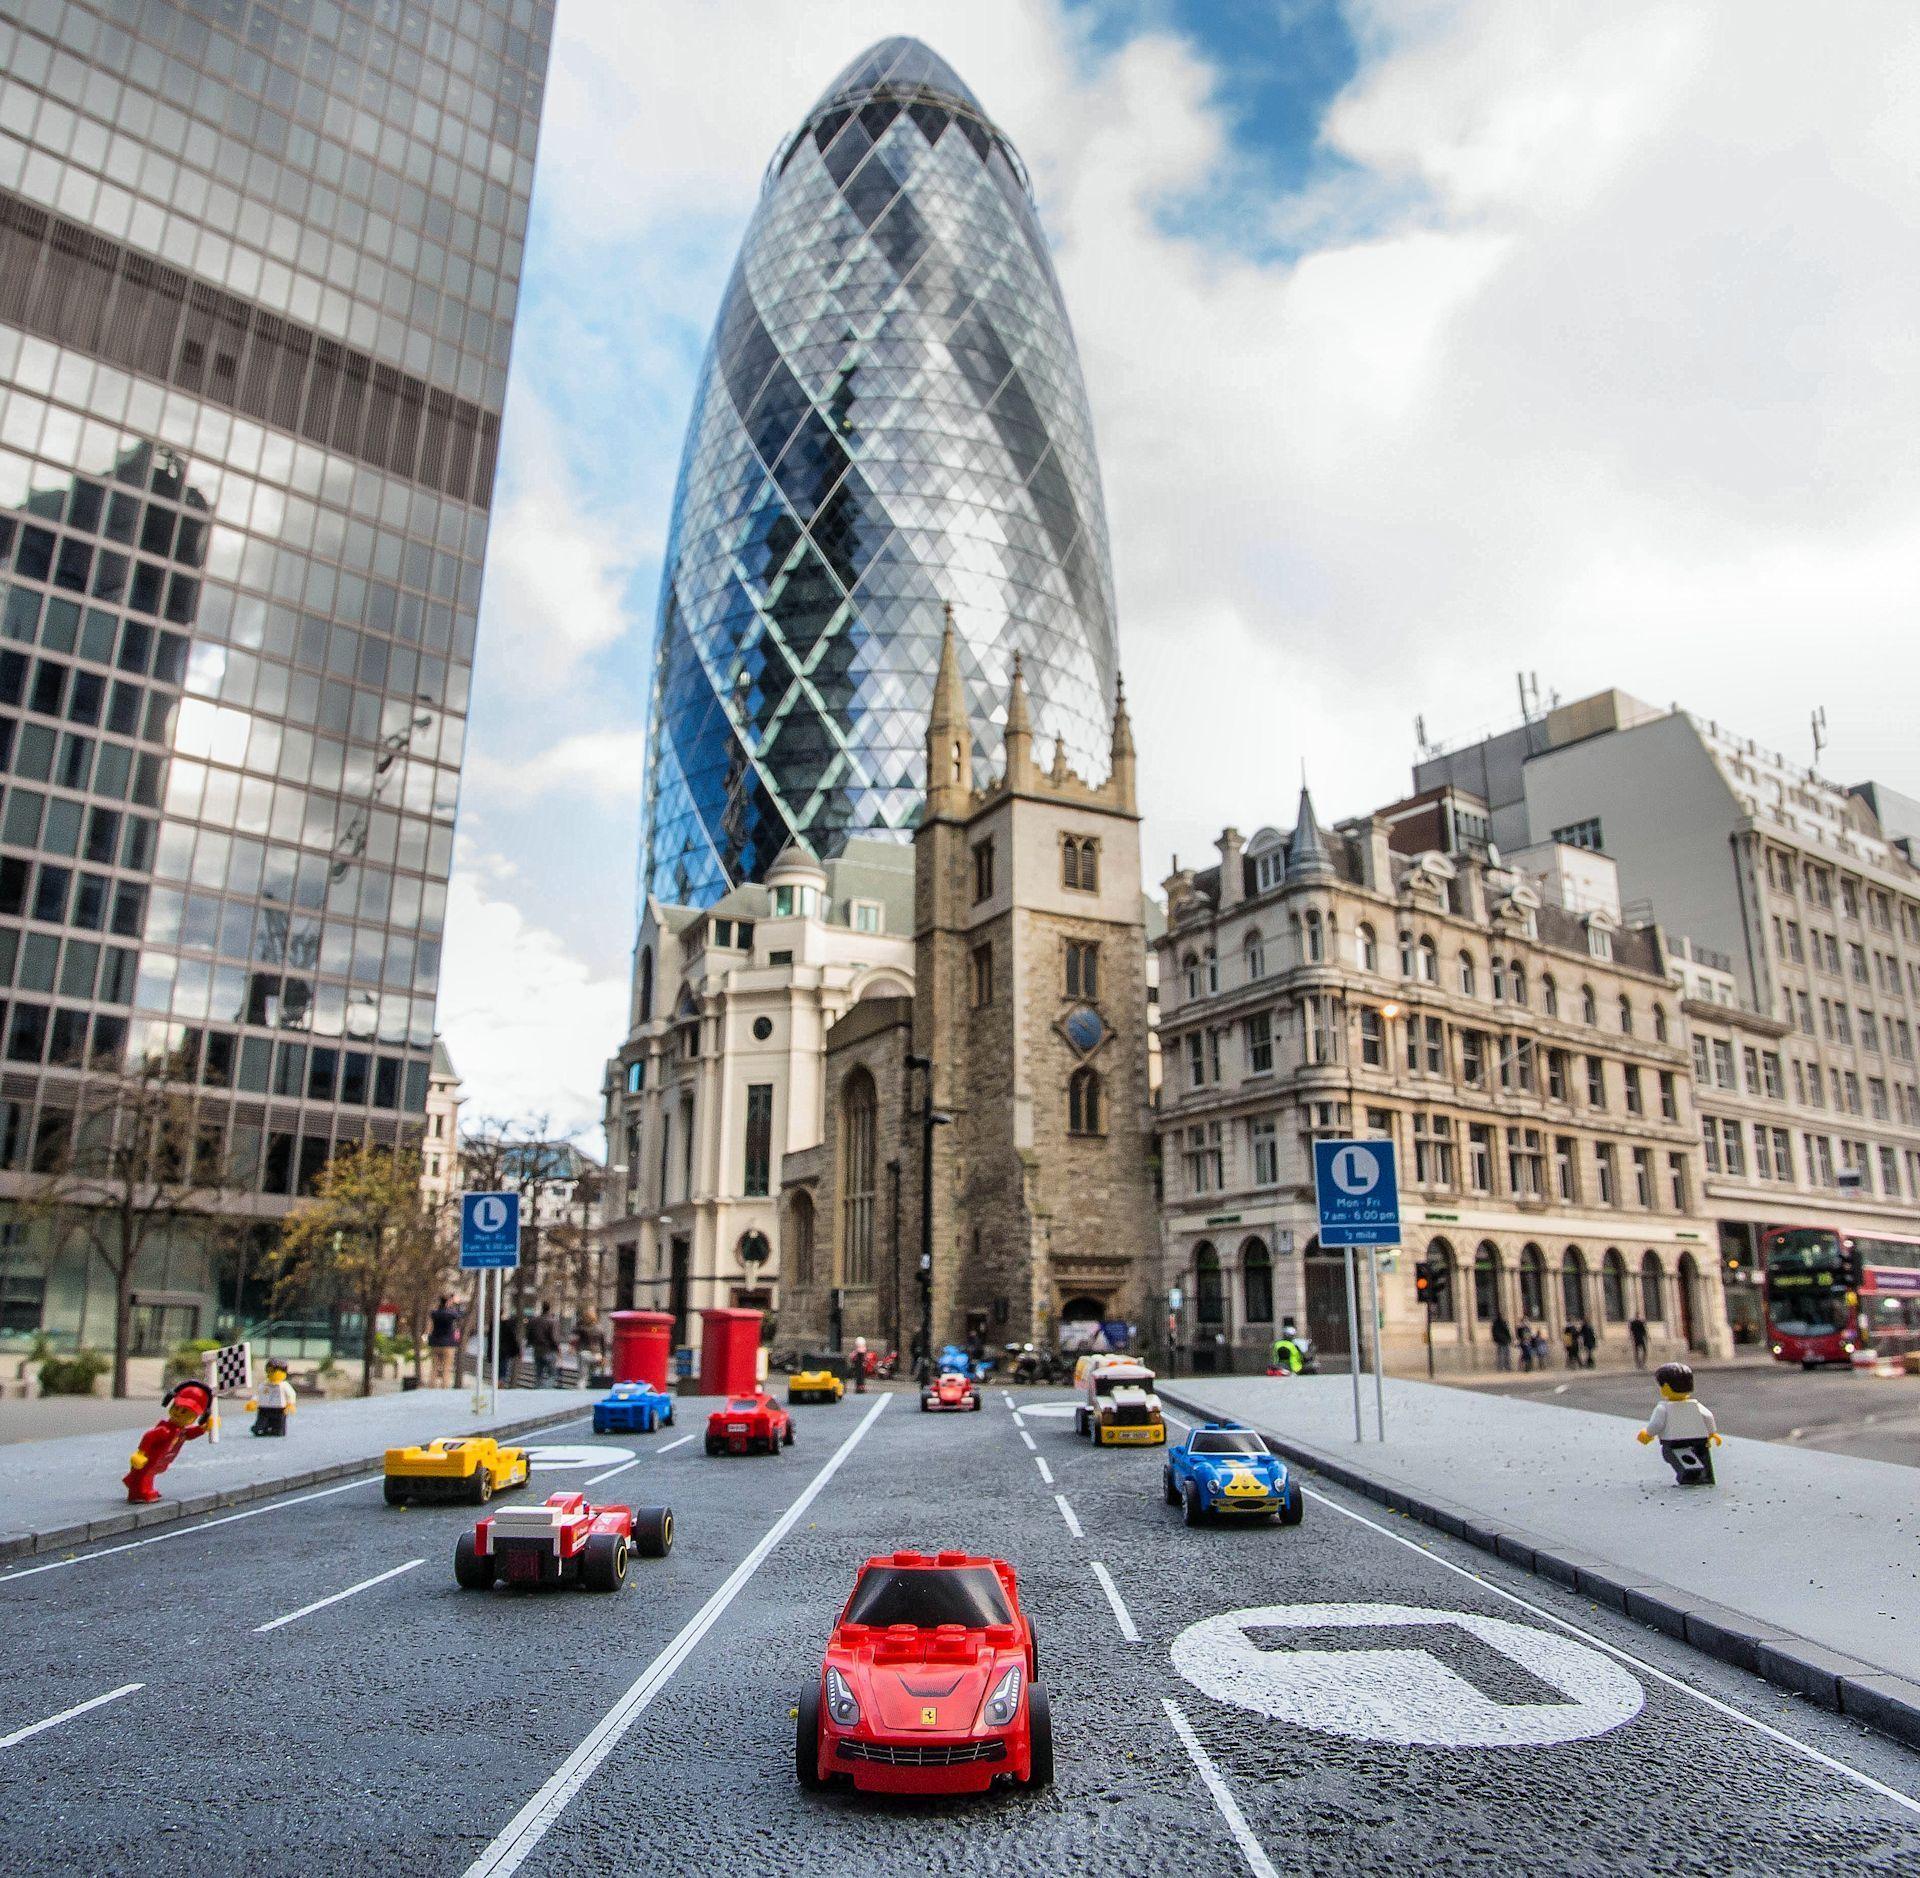 Lego Ferraris roaming the streets of London.